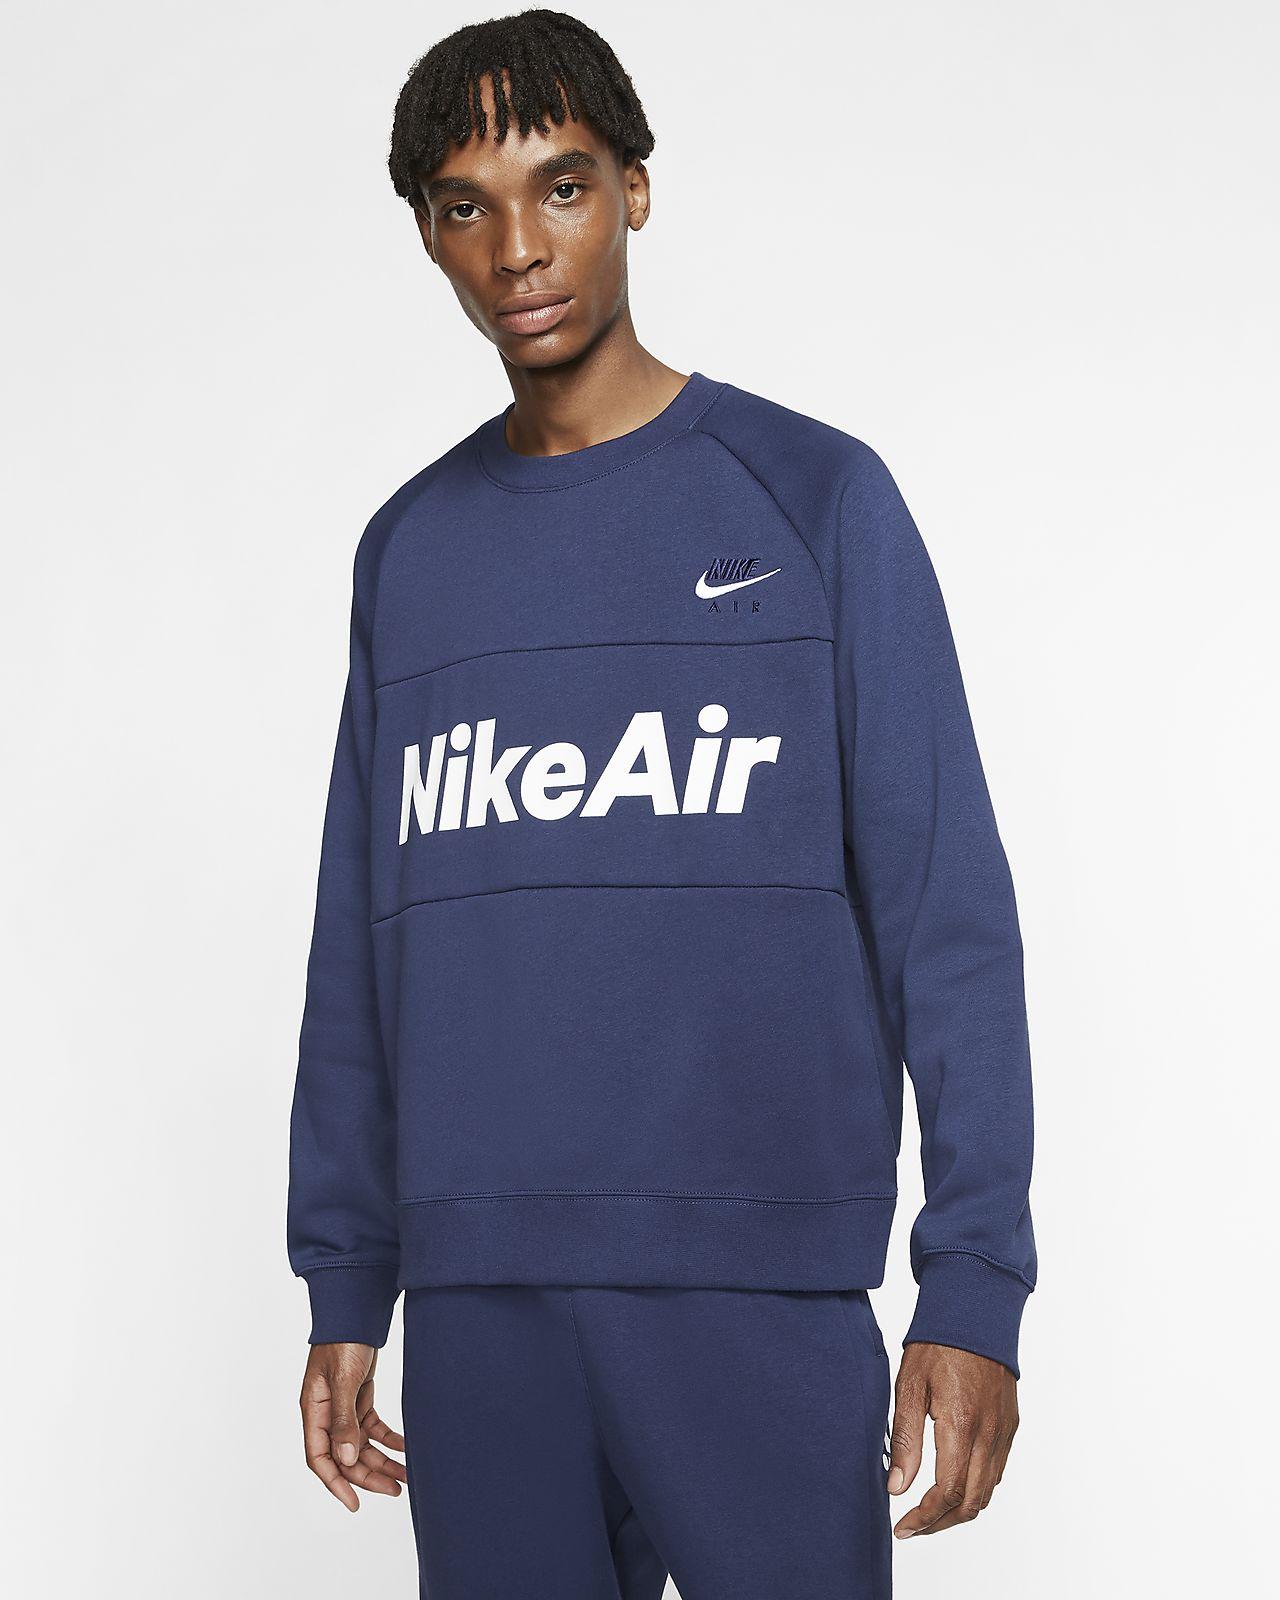 nike air mens clothing